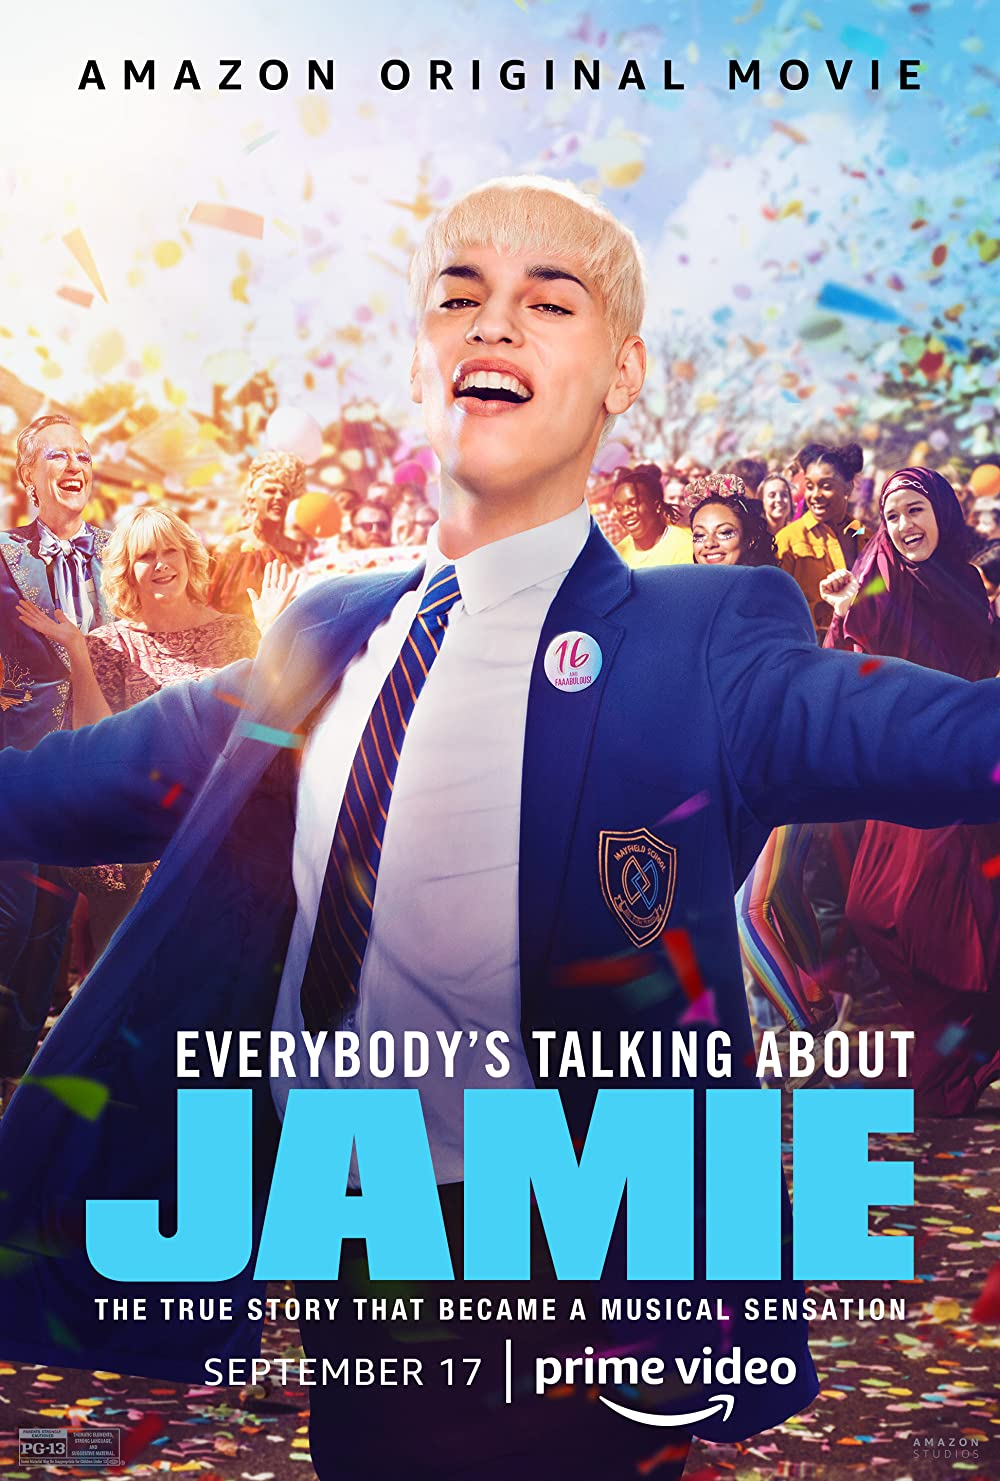 Everybody's Talking About Jamie 2021 Hindi ORG Dual Audio 480p AMZN HDRip 400MB Download